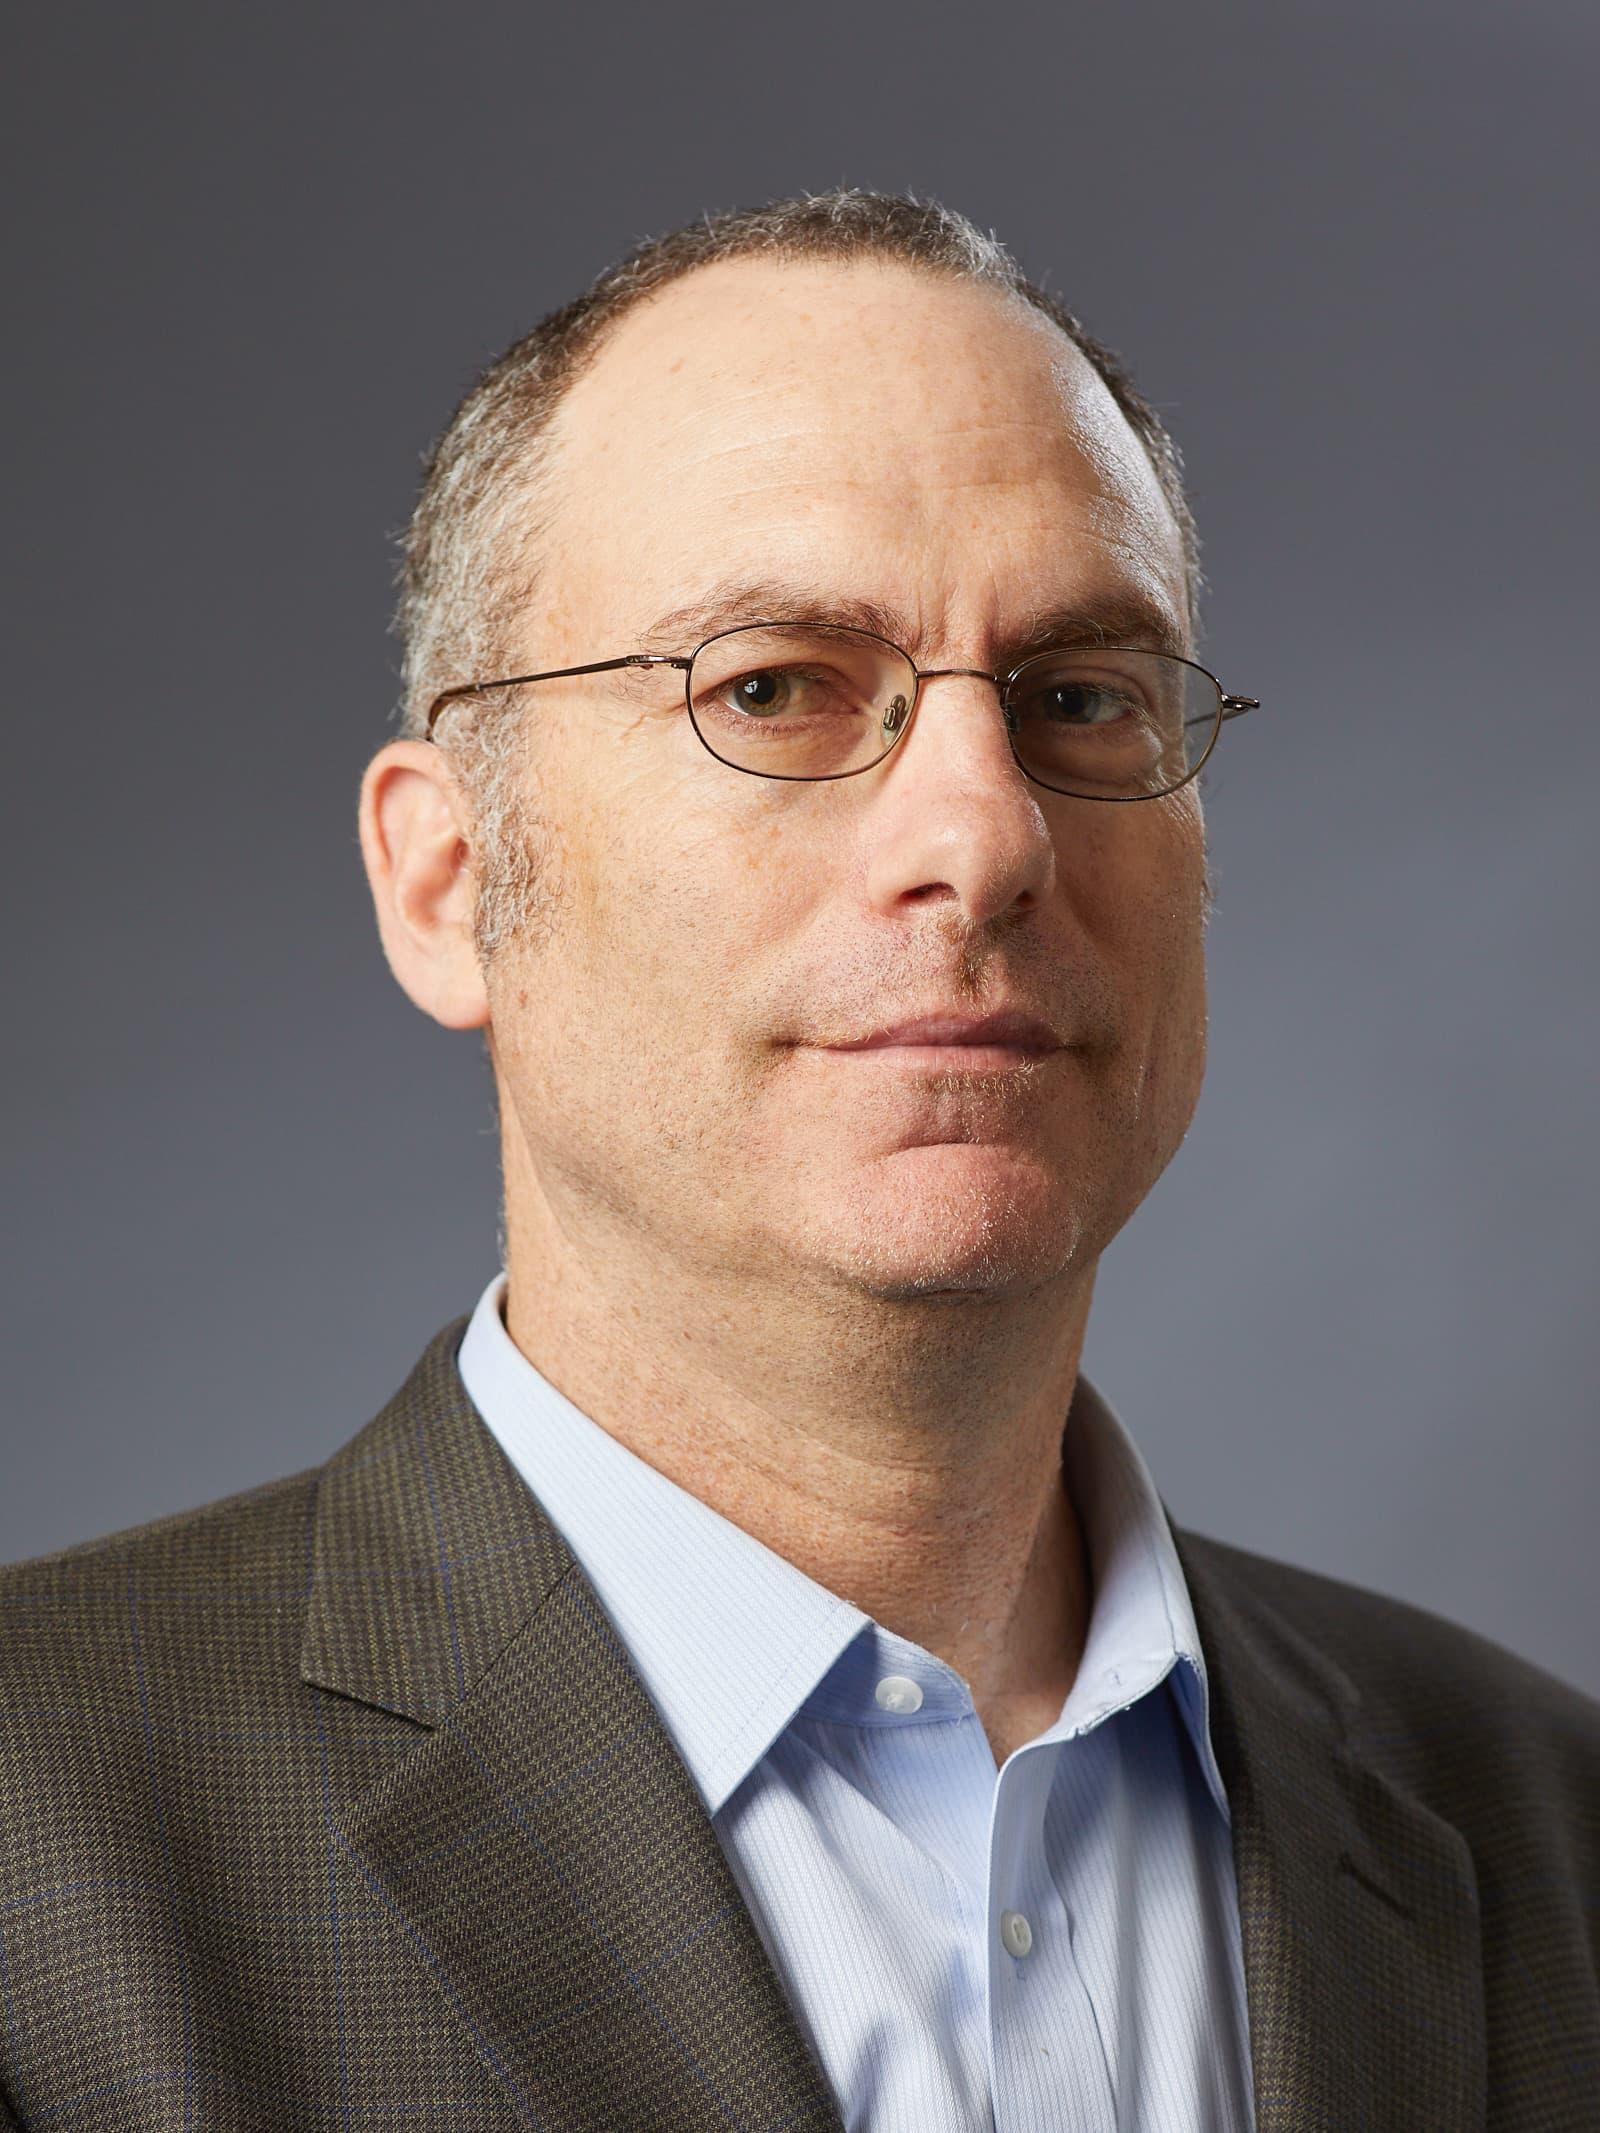 Daniel Greif